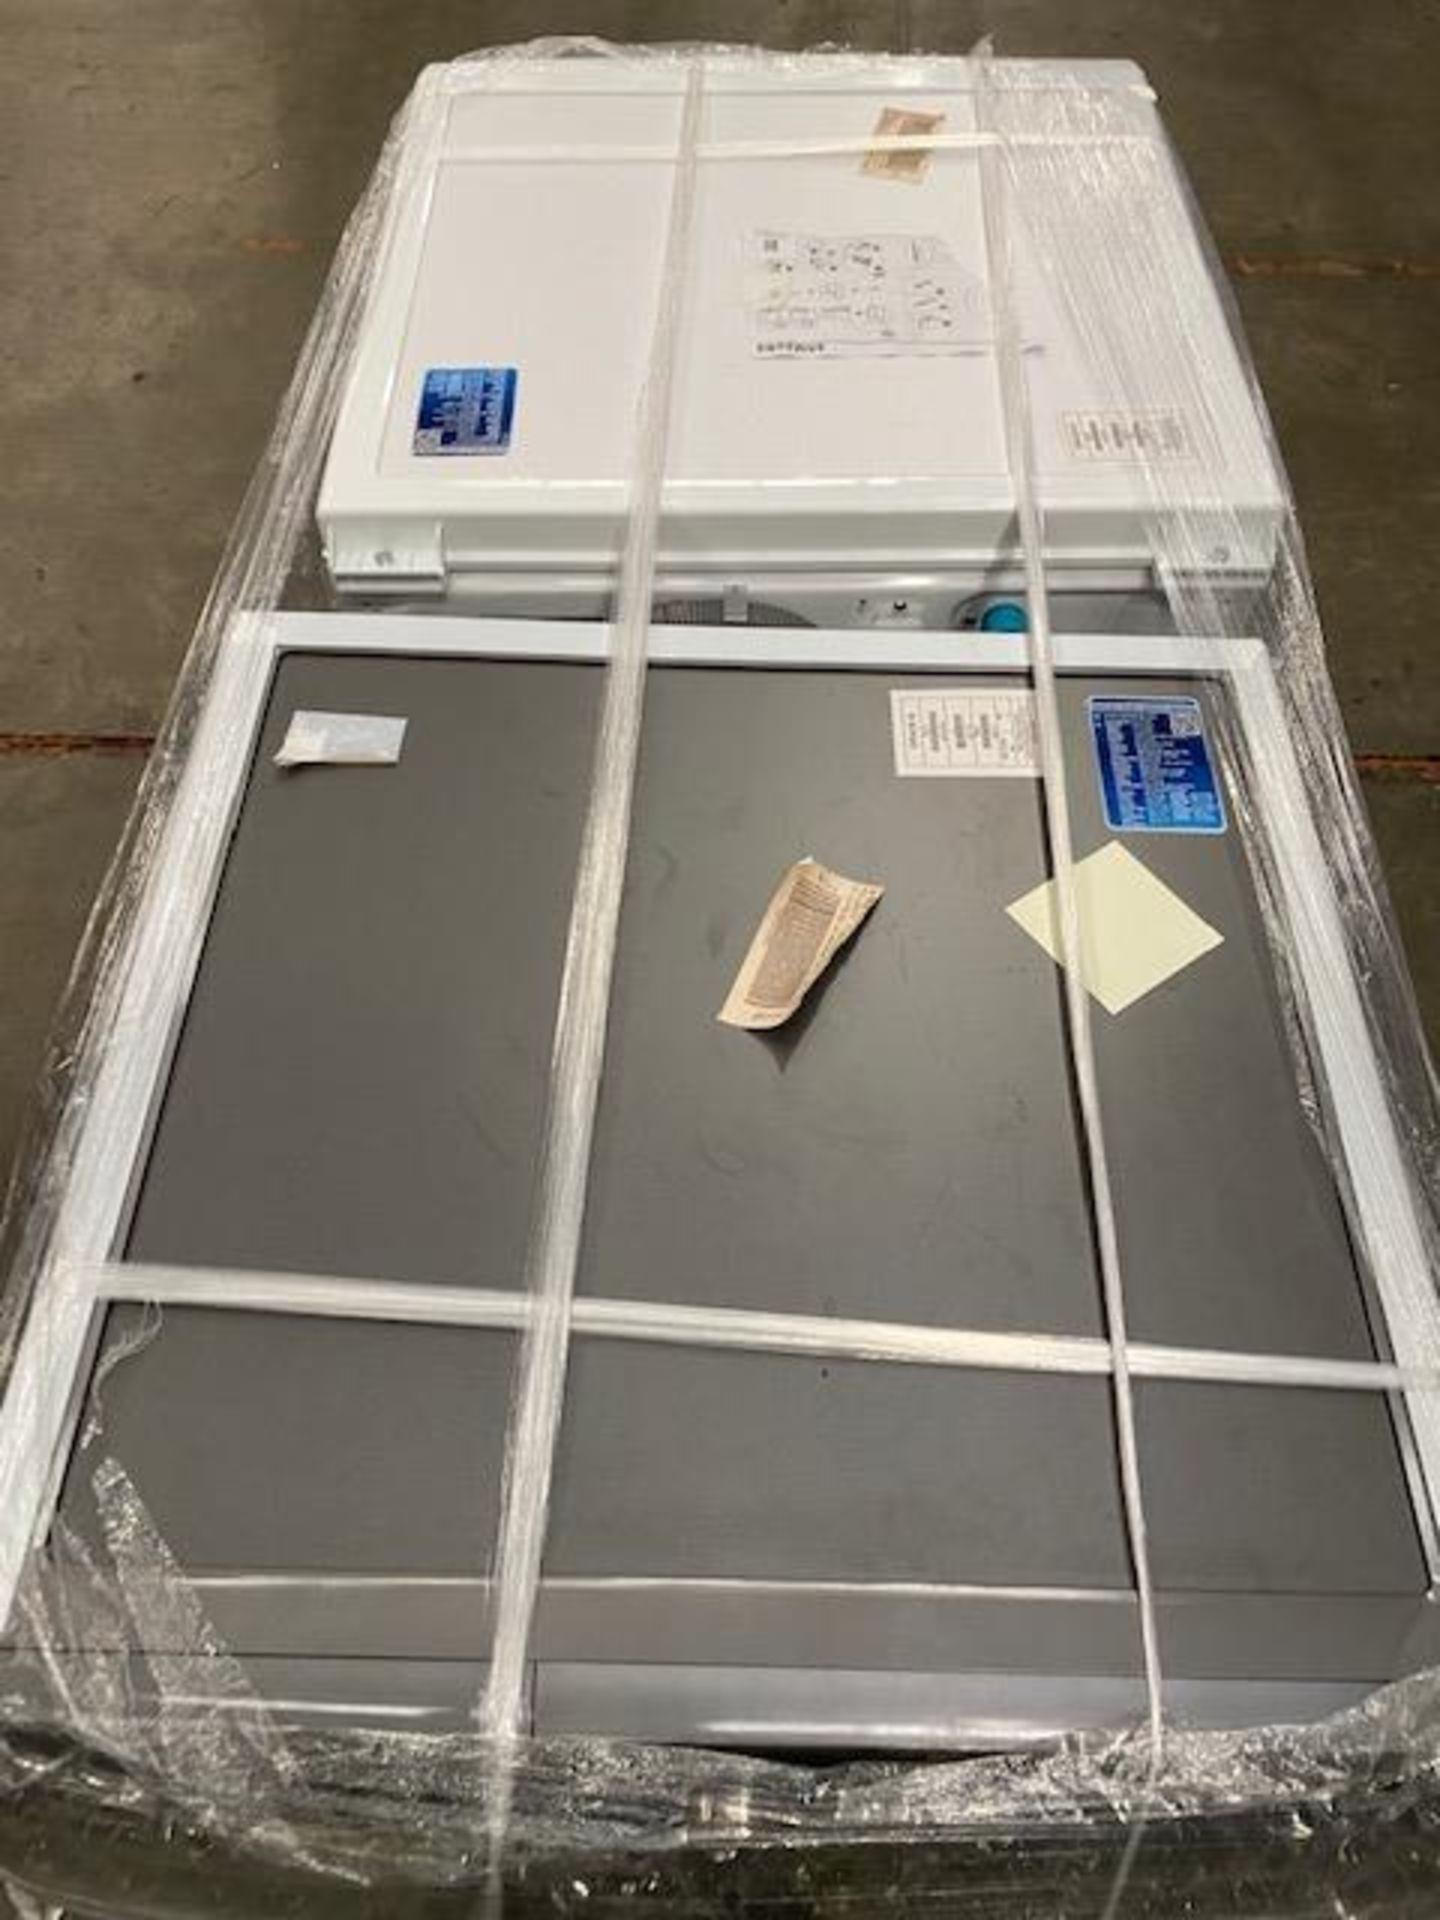 Lot 16 - Pallet of 2 Samsung Premium Washing machines. Total Latest selling price £1,219.97*